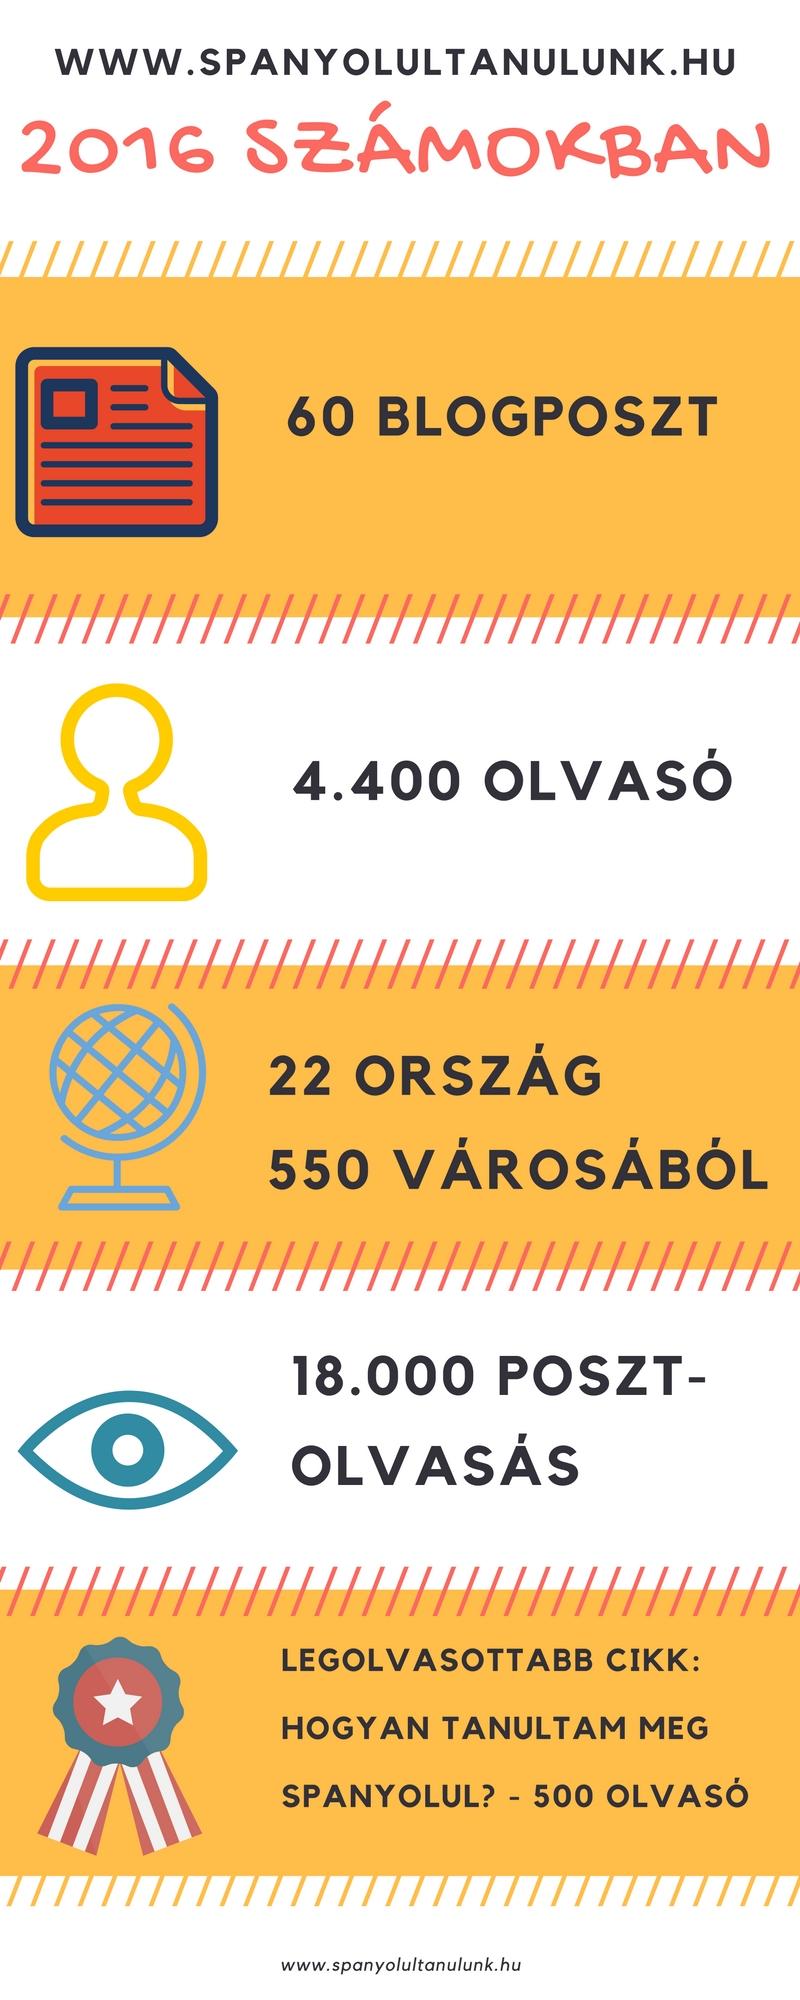 spanyolultanulunk_infografika_2016